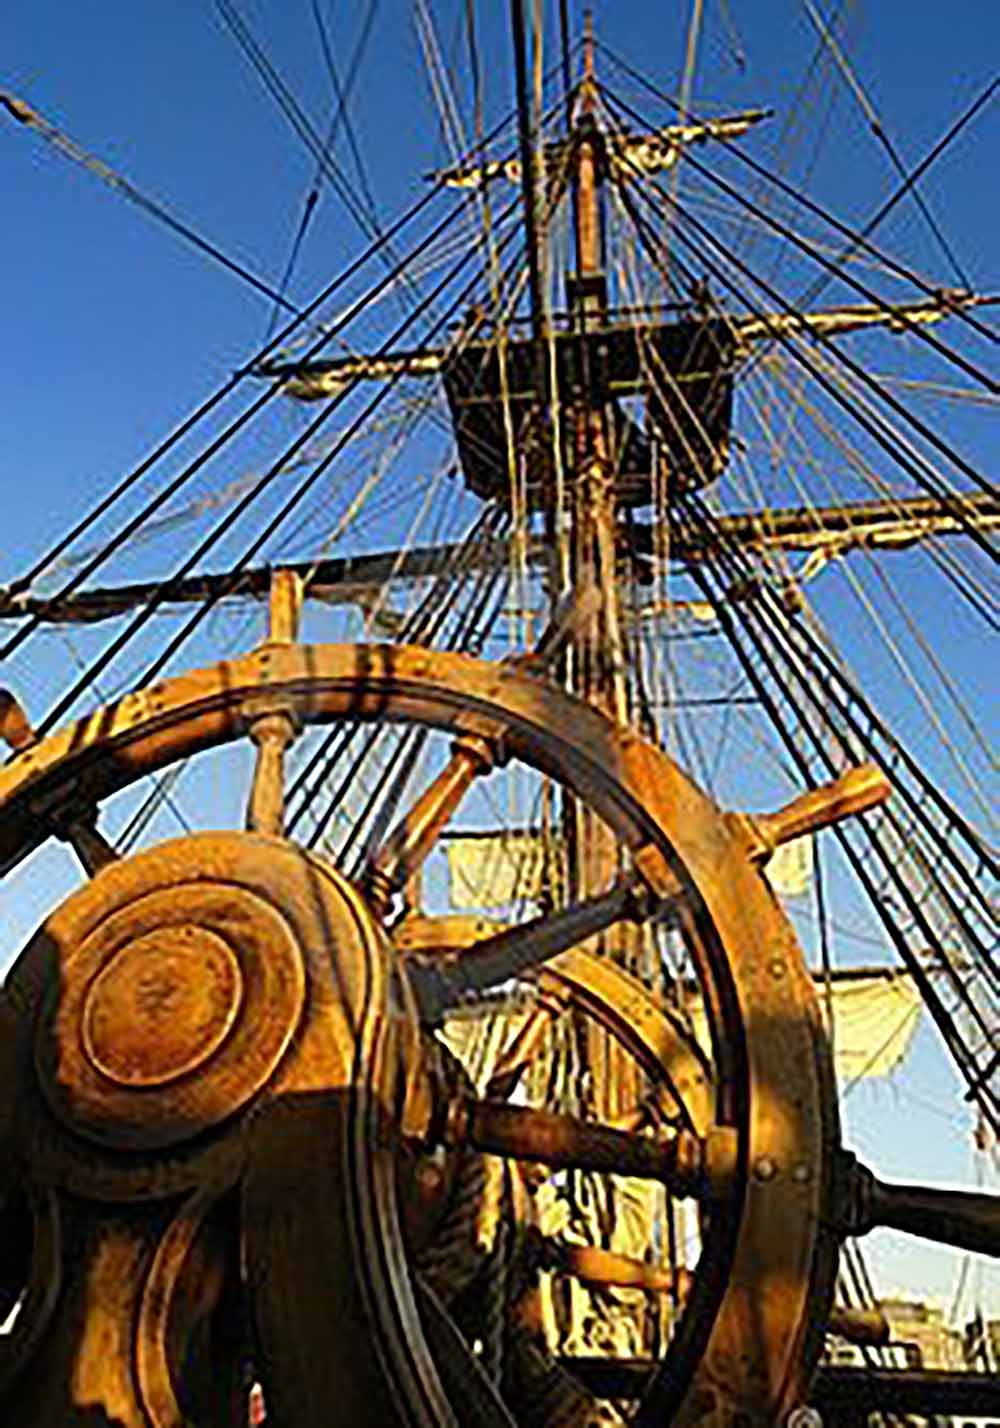 helmsmen steer ships